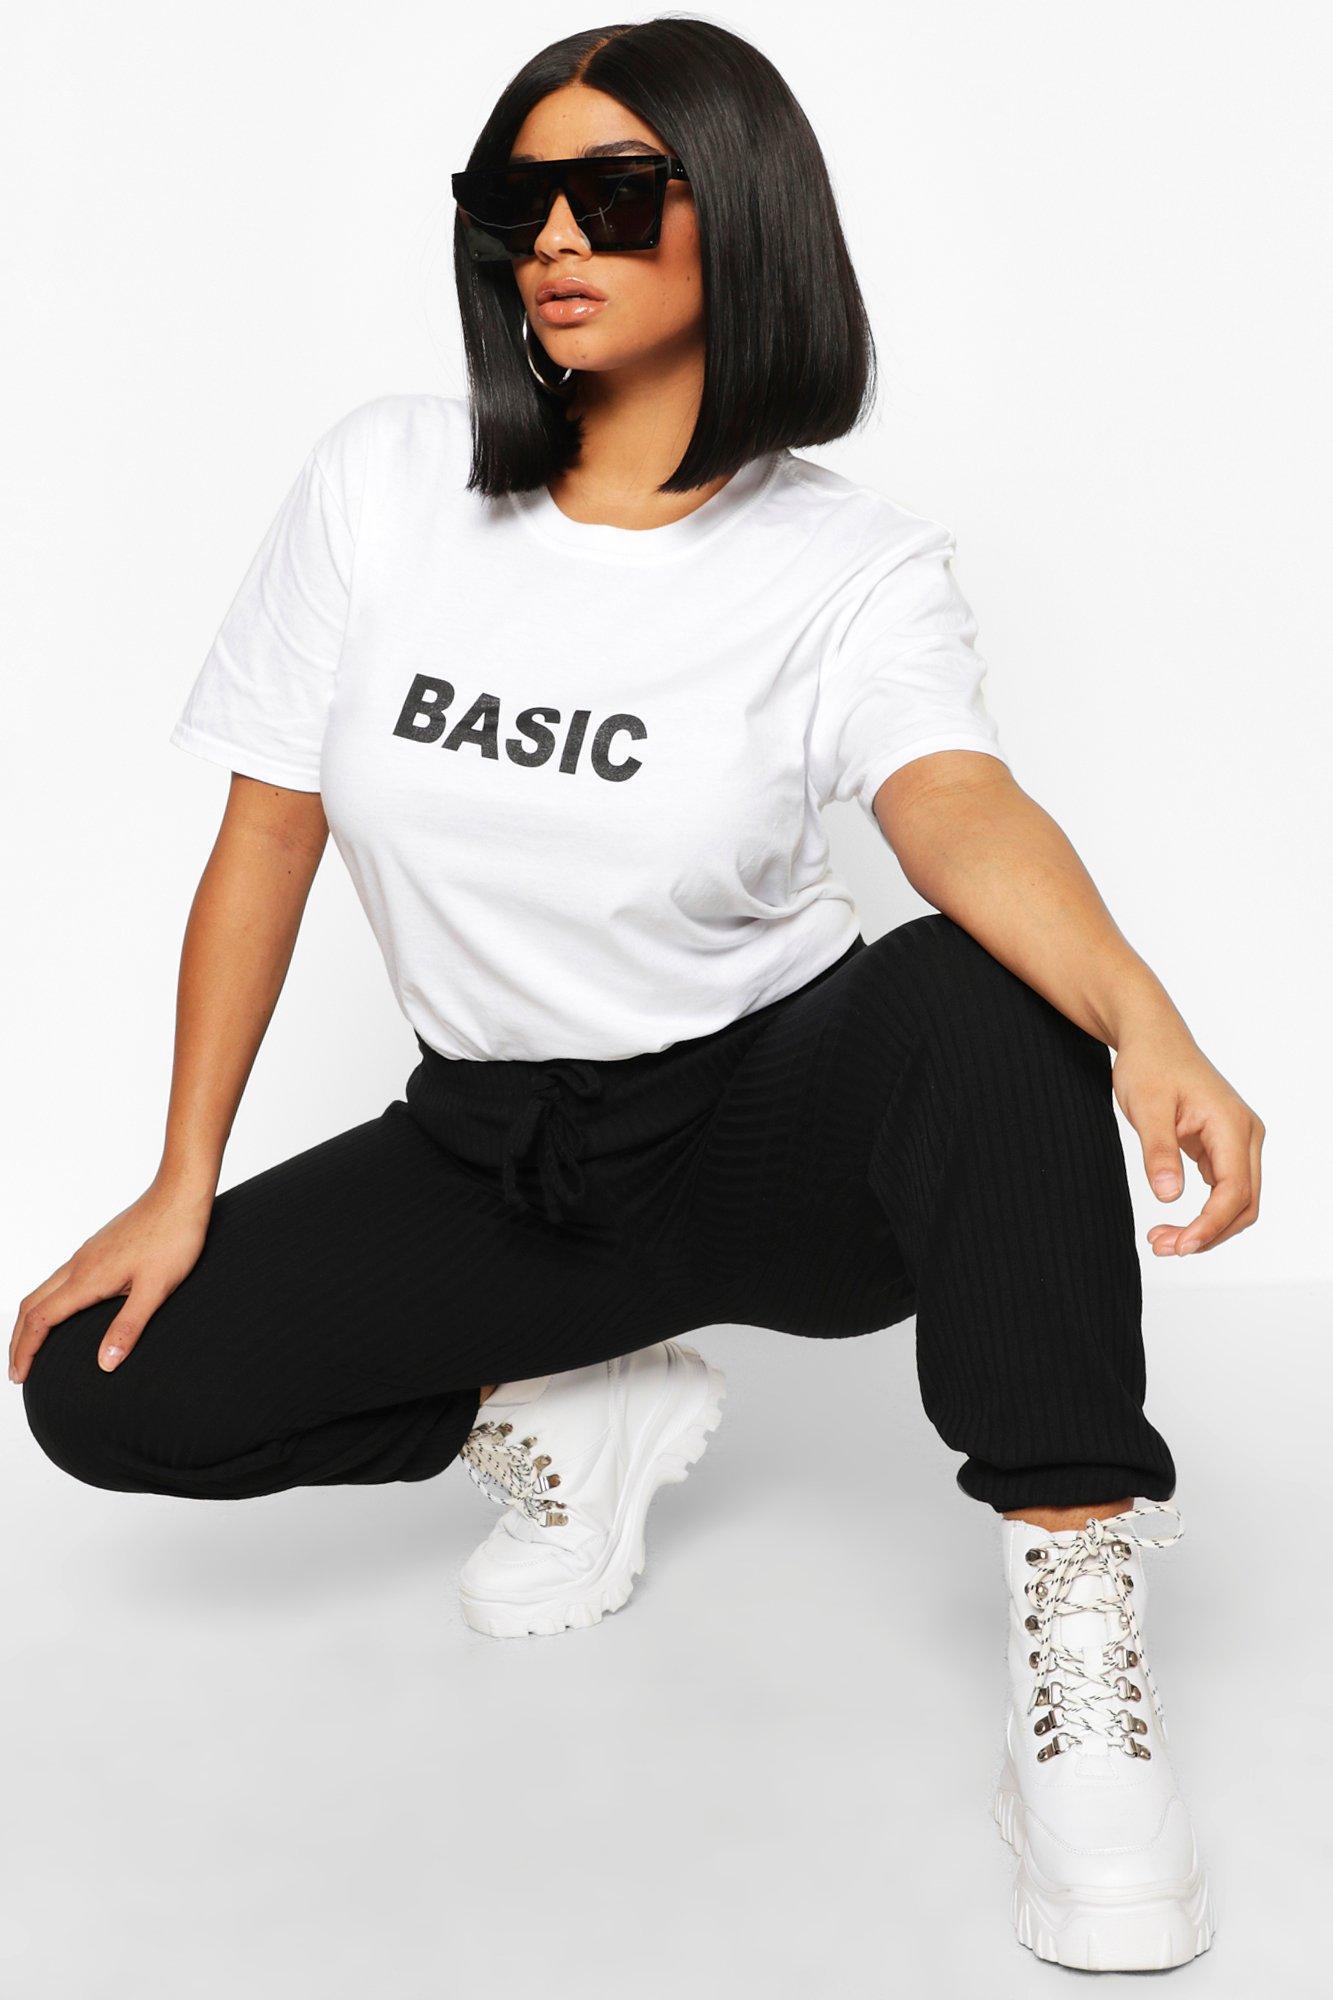 Womens Plus 'Basic' T-Shirts - Weiß - 52, Weiß - Boohoo.com